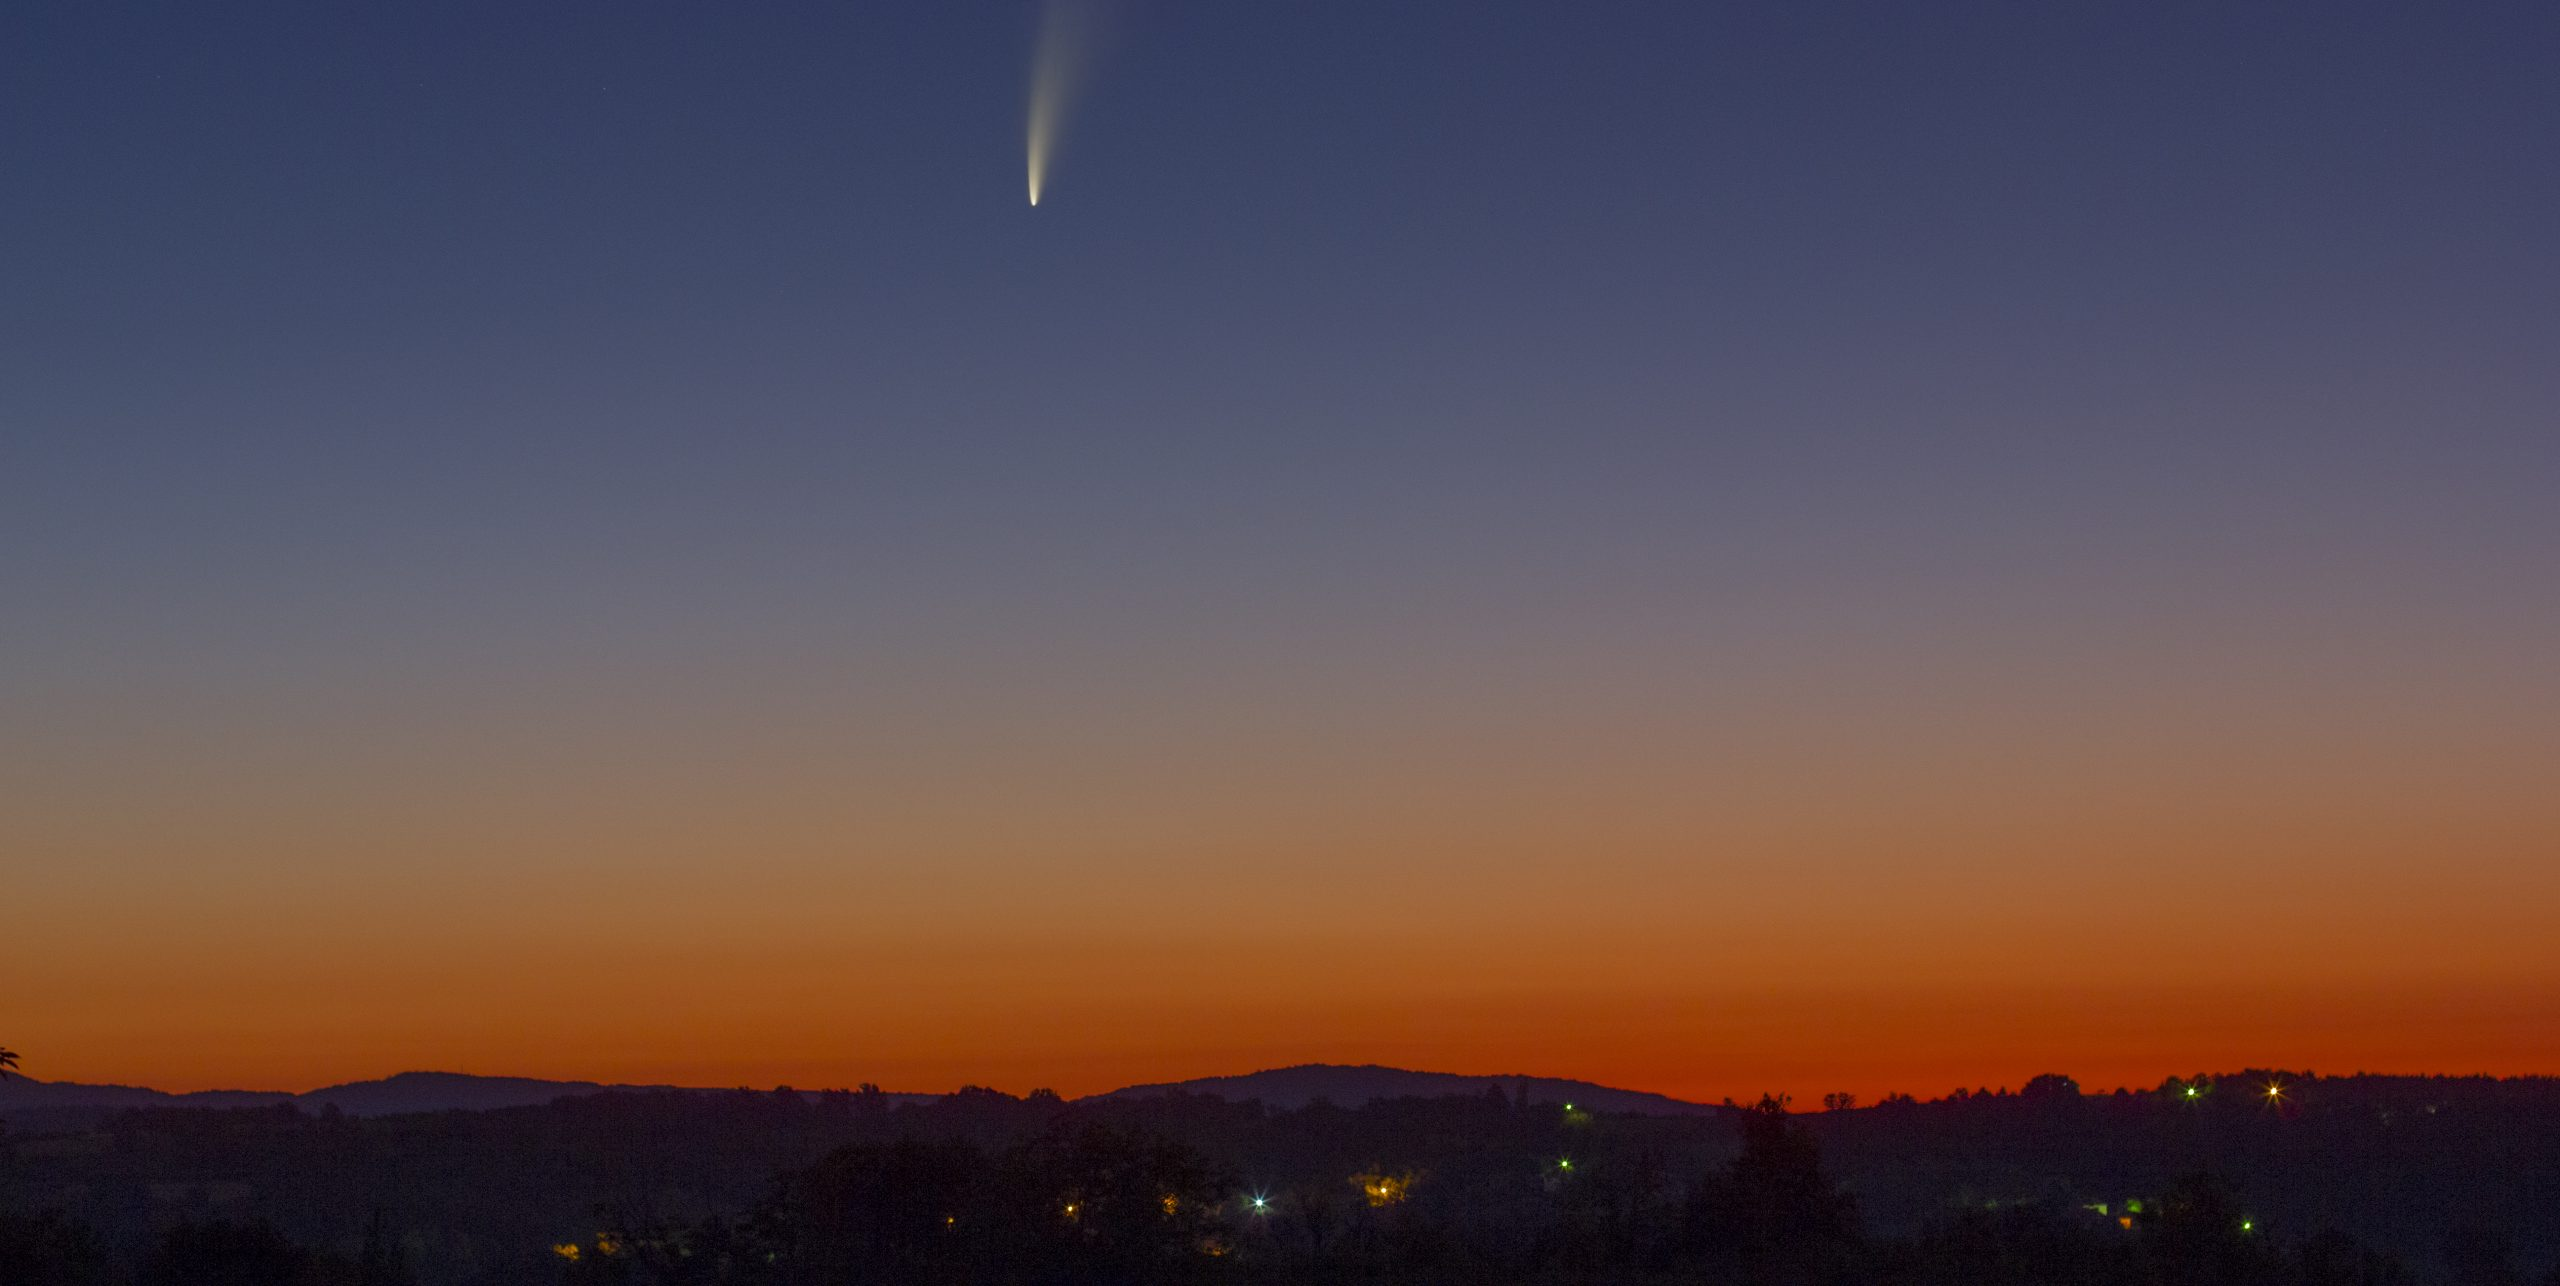 Kometa 1 scaled - Comet C/2020 F3 Neowise